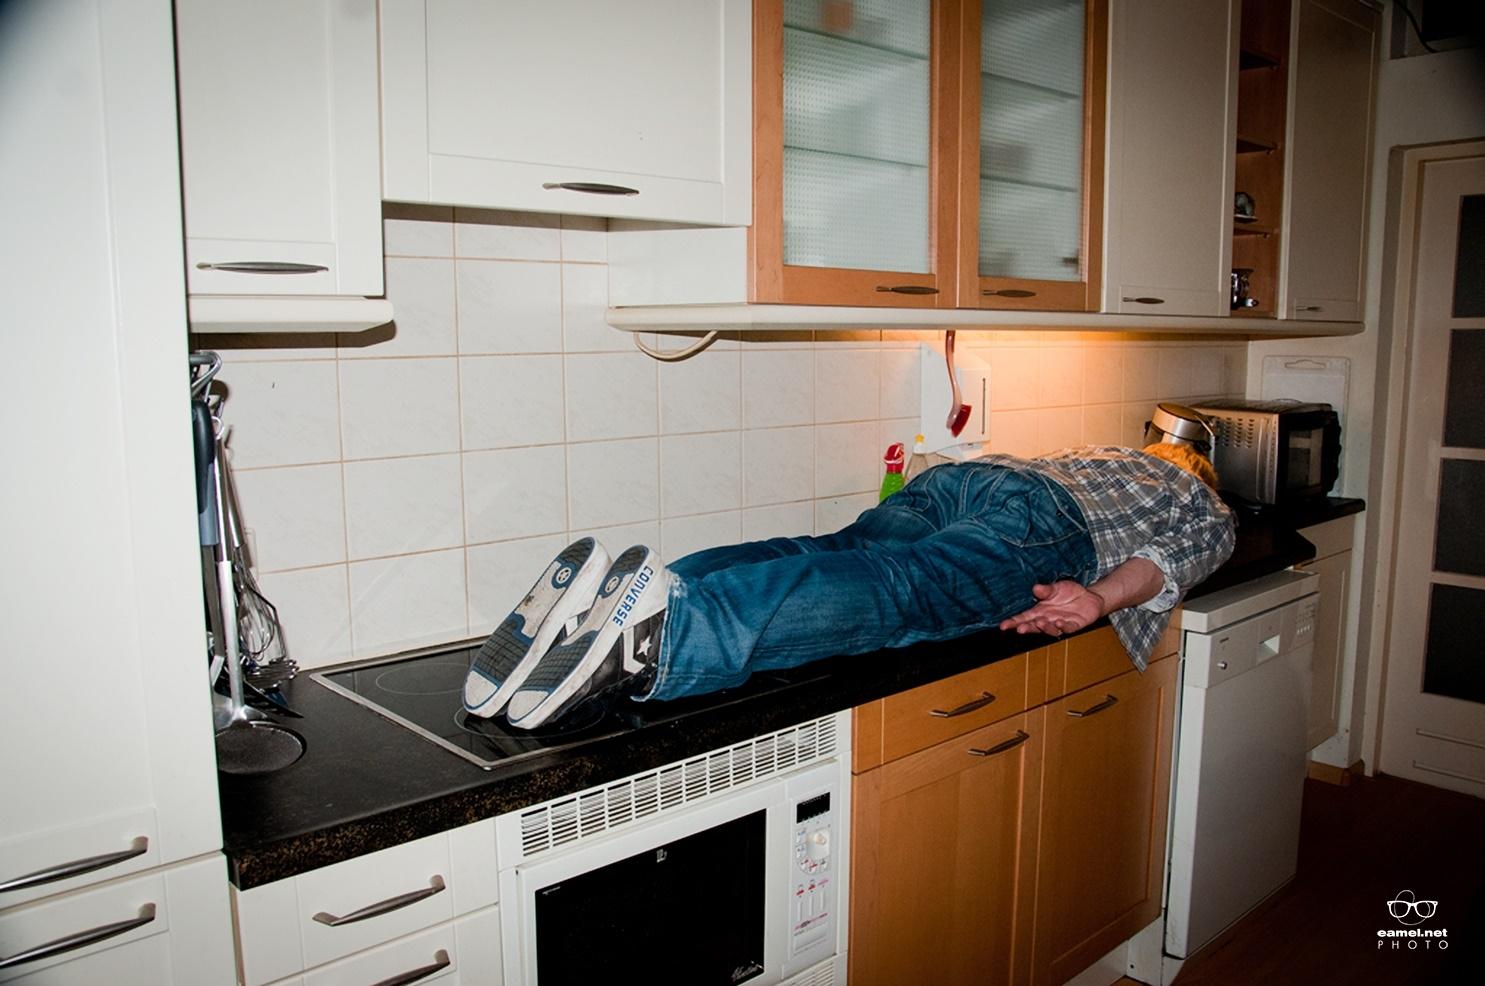 planking grut4 - Zoek de plank